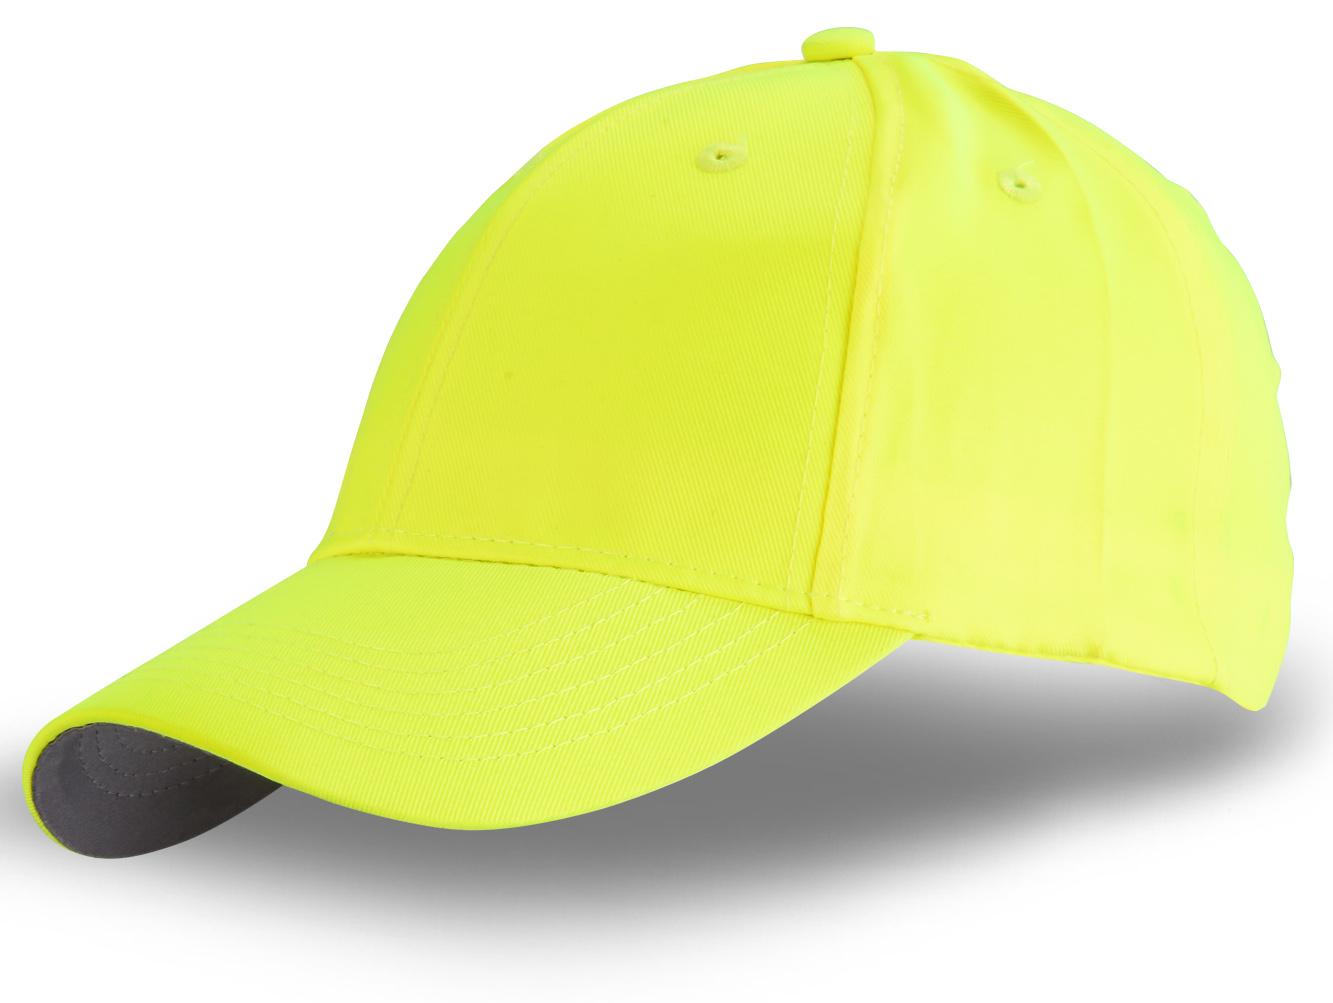 Желтая бейсболка - купить онлайн